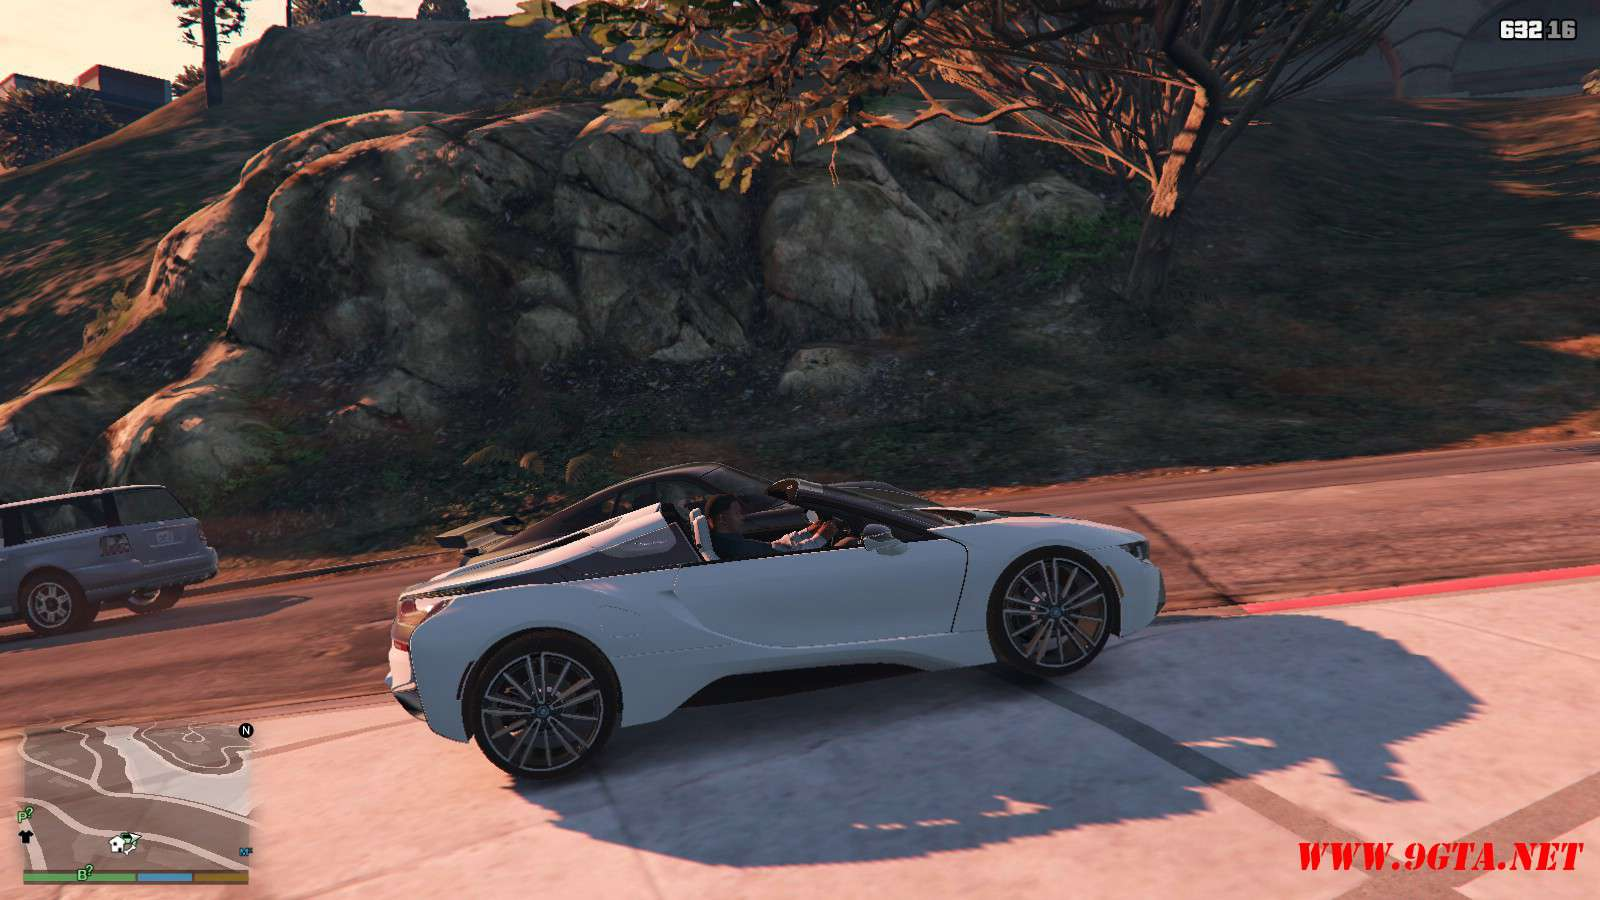 2019 BMW I8 Roadster GTA5 Mods (1)